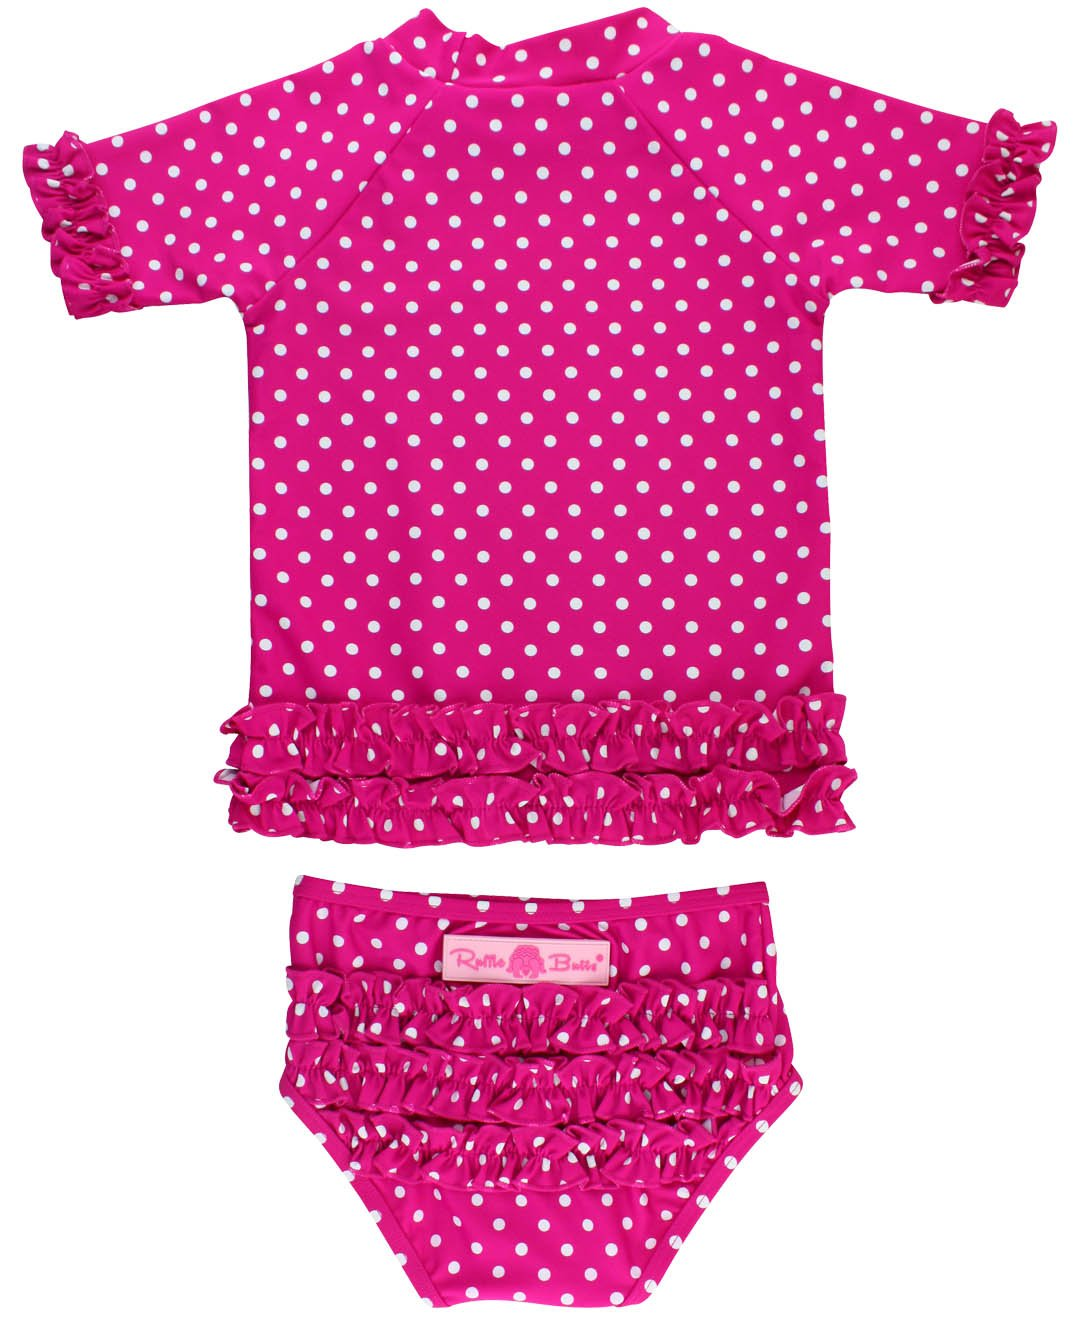 RuffleButts Little Girls Rash Guard 2-Piece Swimsuit Set - Berry Polka Dot Bikini with UPF 50+ Sun Protection - 3T by RuffleButts (Image #1)